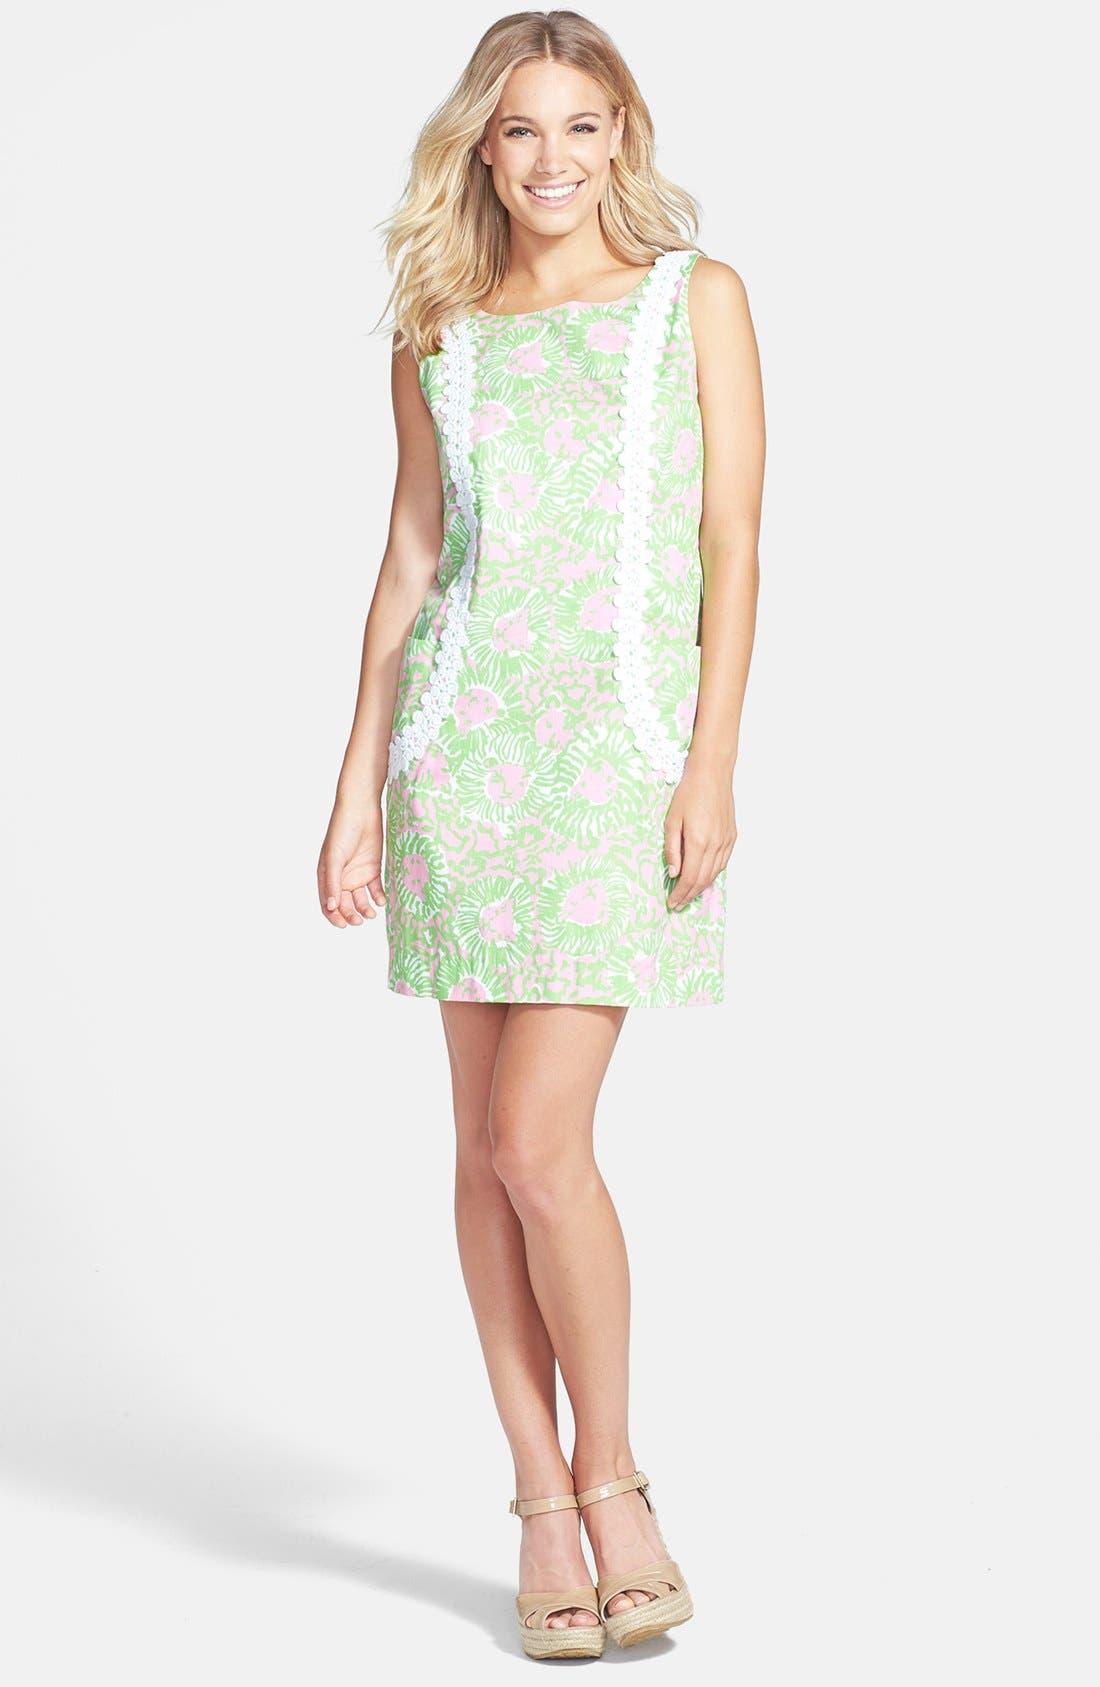 Alternate Image 1 Selected - Lilly Pulitzer® 'Liz' Print Shift Dress